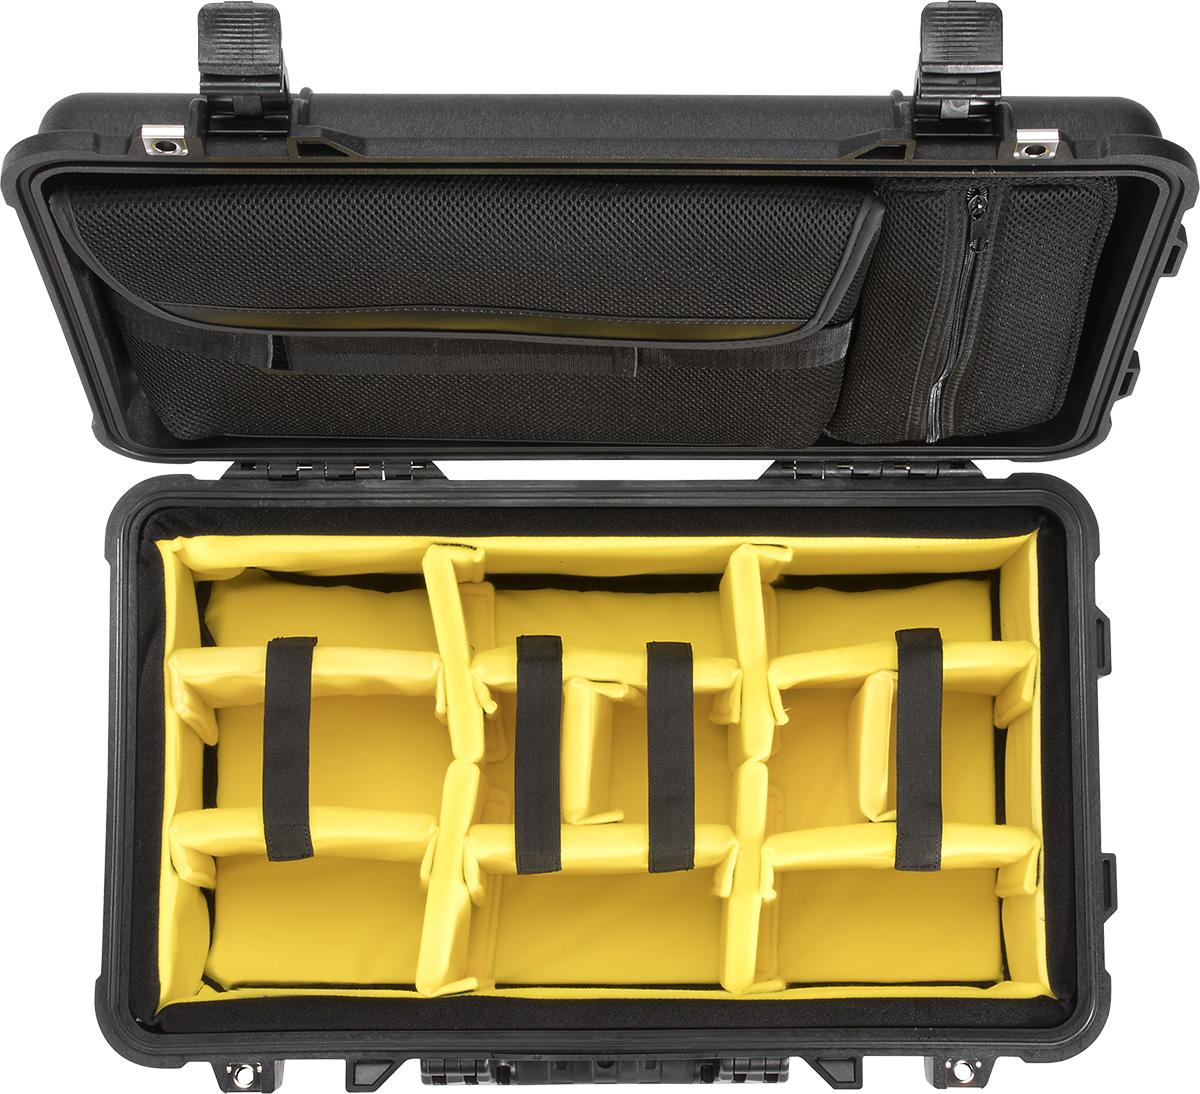 pelican peli products 1510SC camera laptop rolling travel hard case